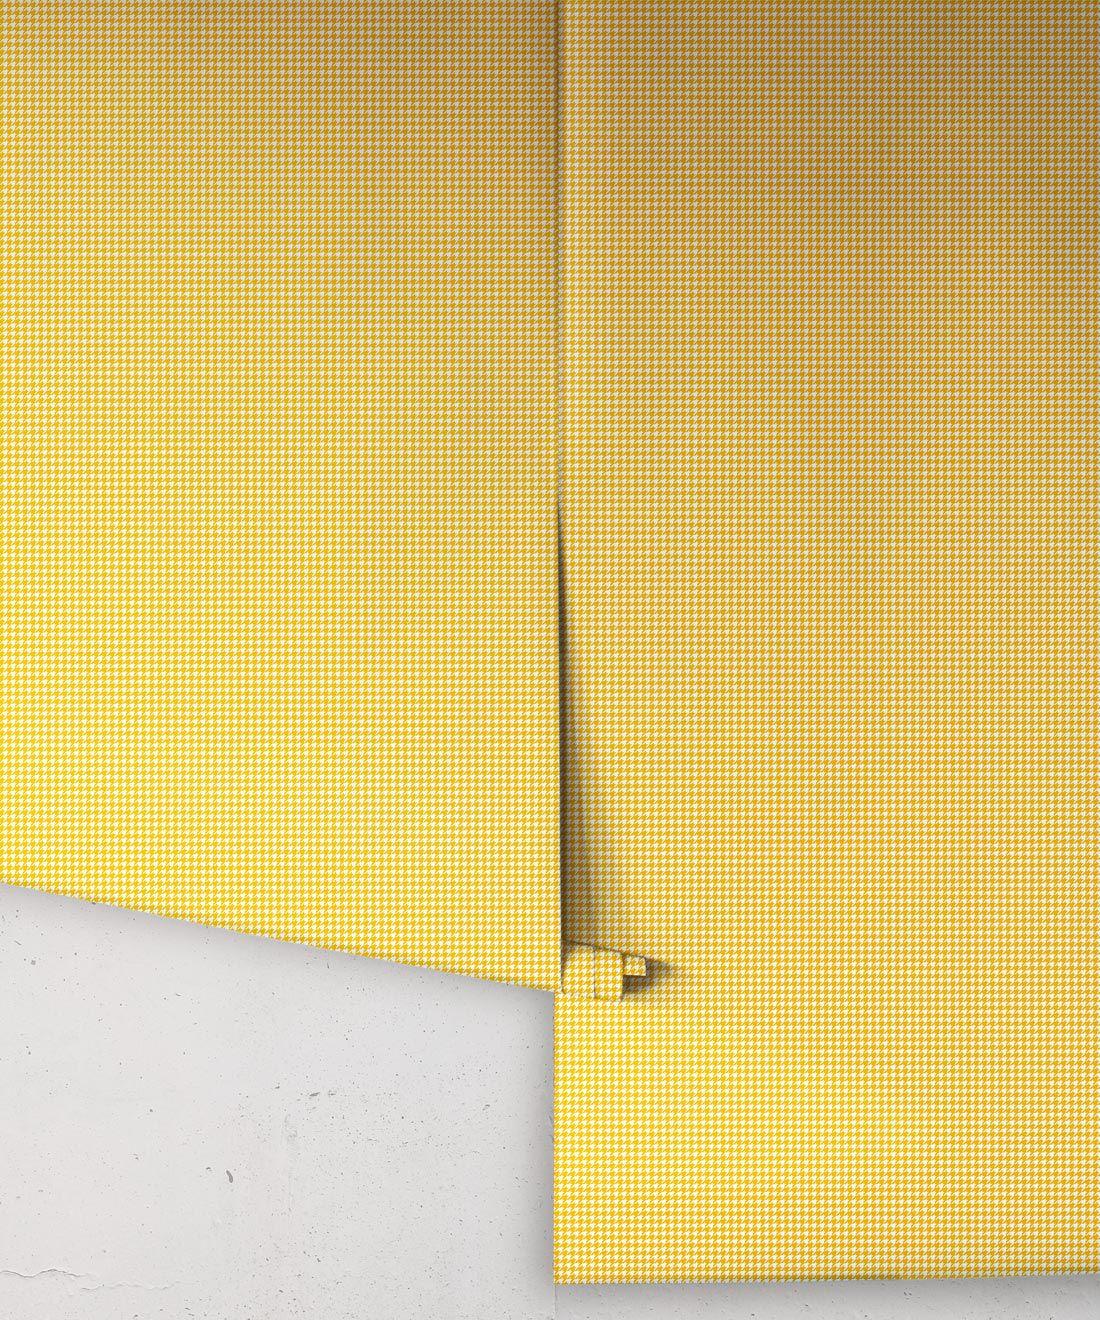 Houndstooth Wallpaper • Dogstooth Wallpaper • Yellow Sunshine •Rolls